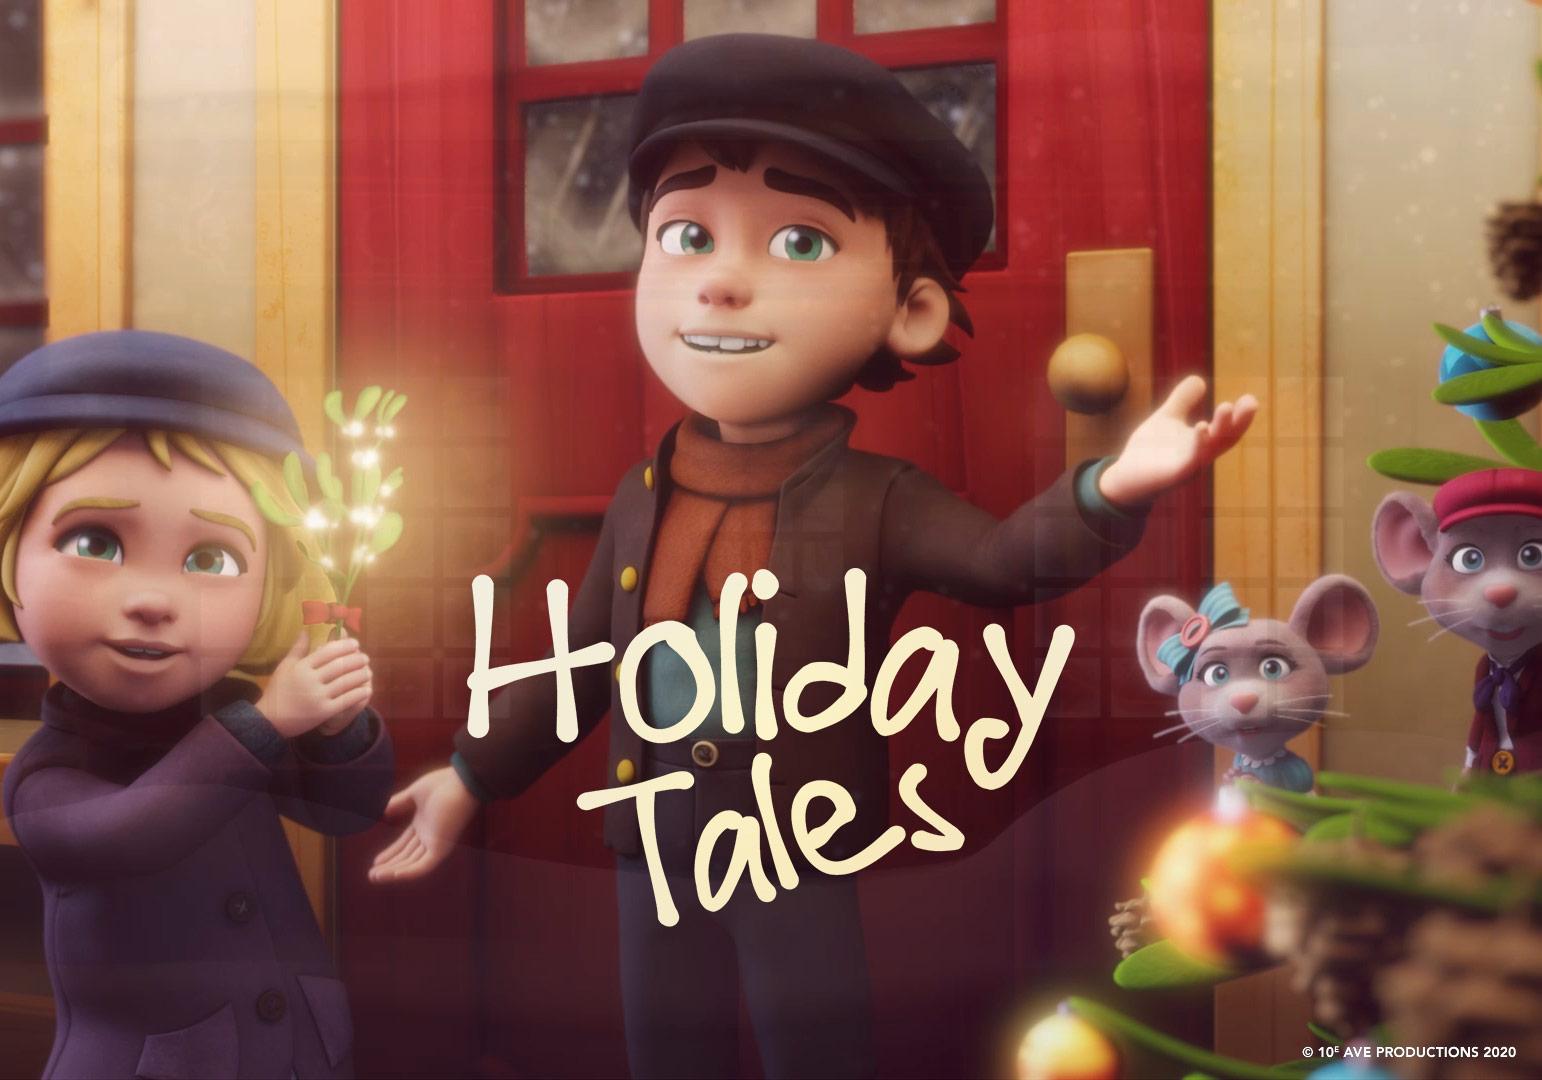 Holiday Tales Affiche 10Ave Developpement en